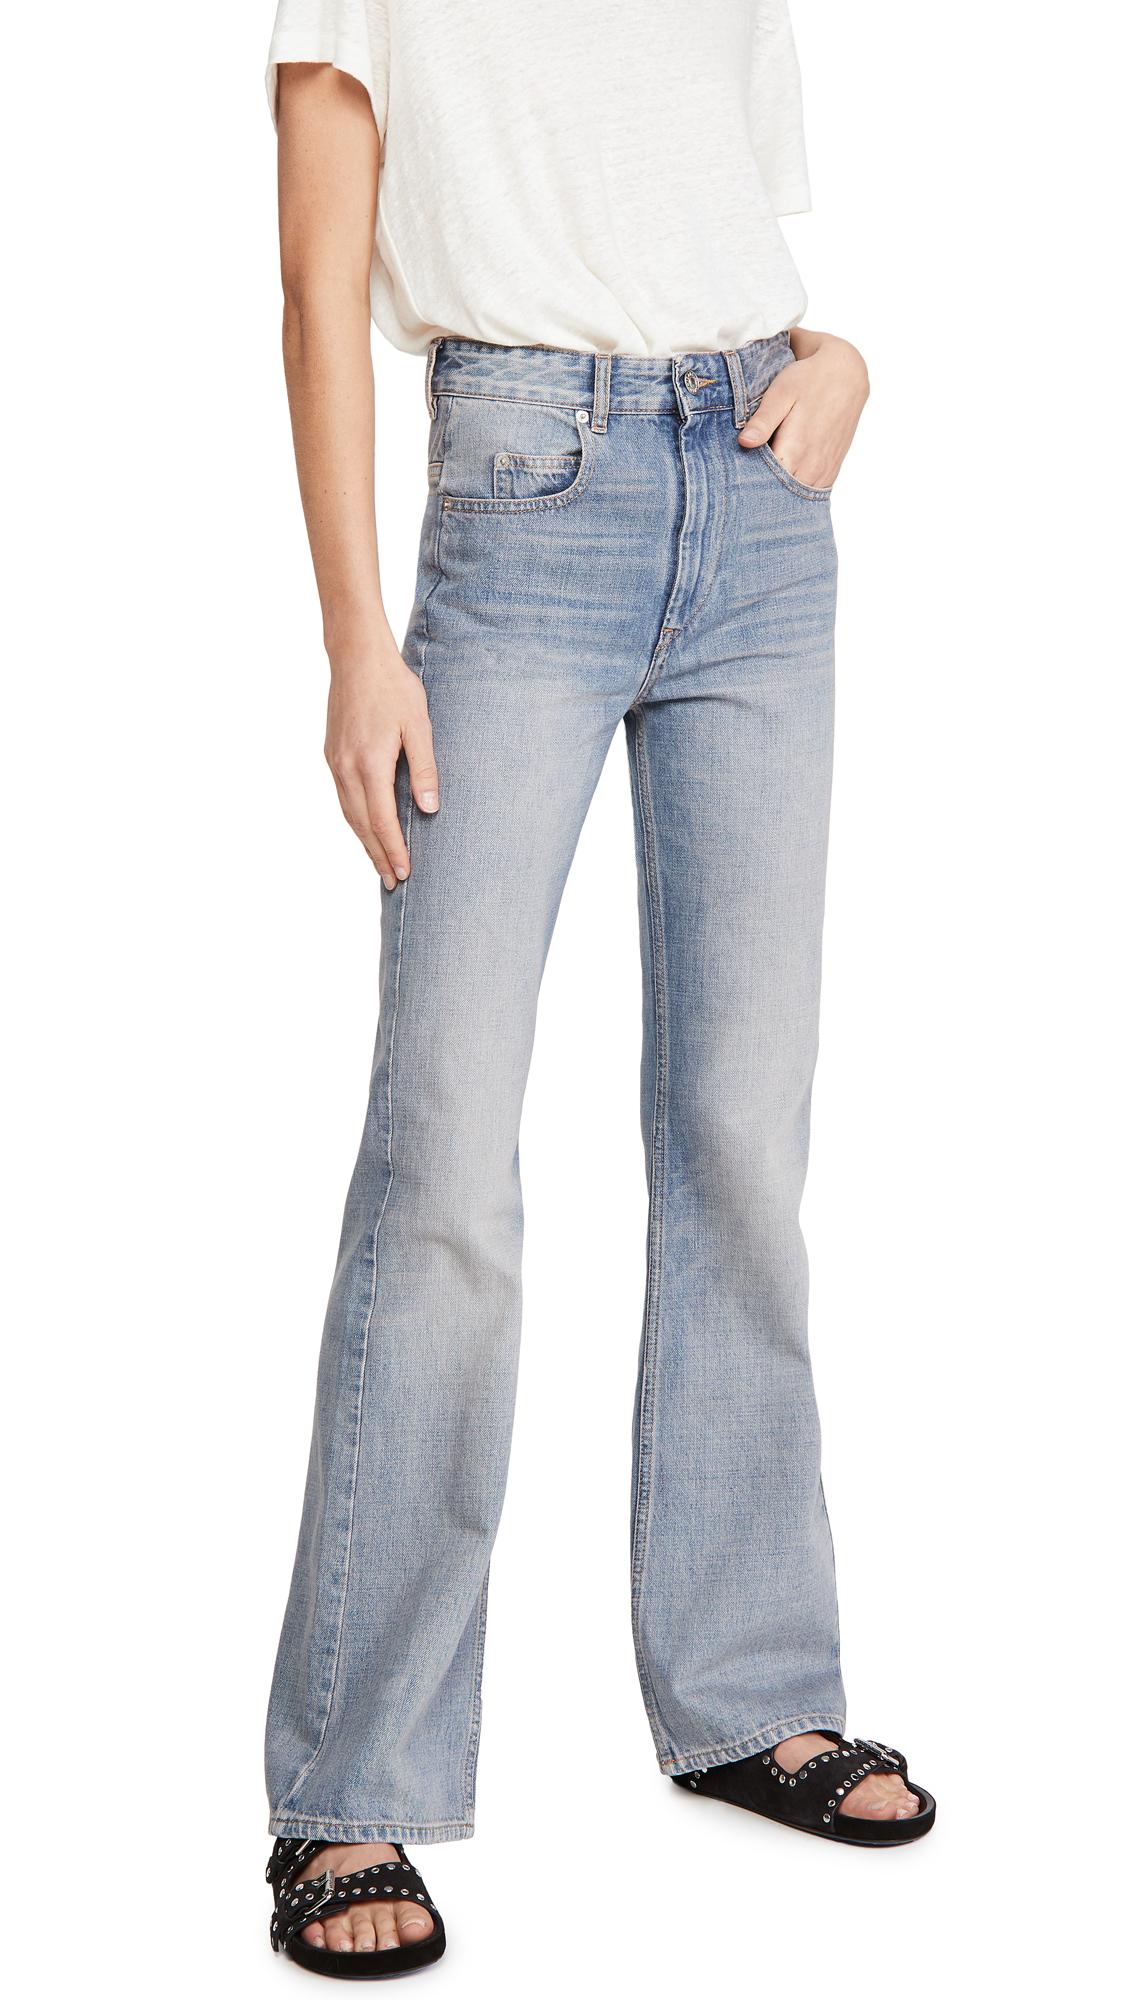 Isabel Marant Etoile Belvira Jeans